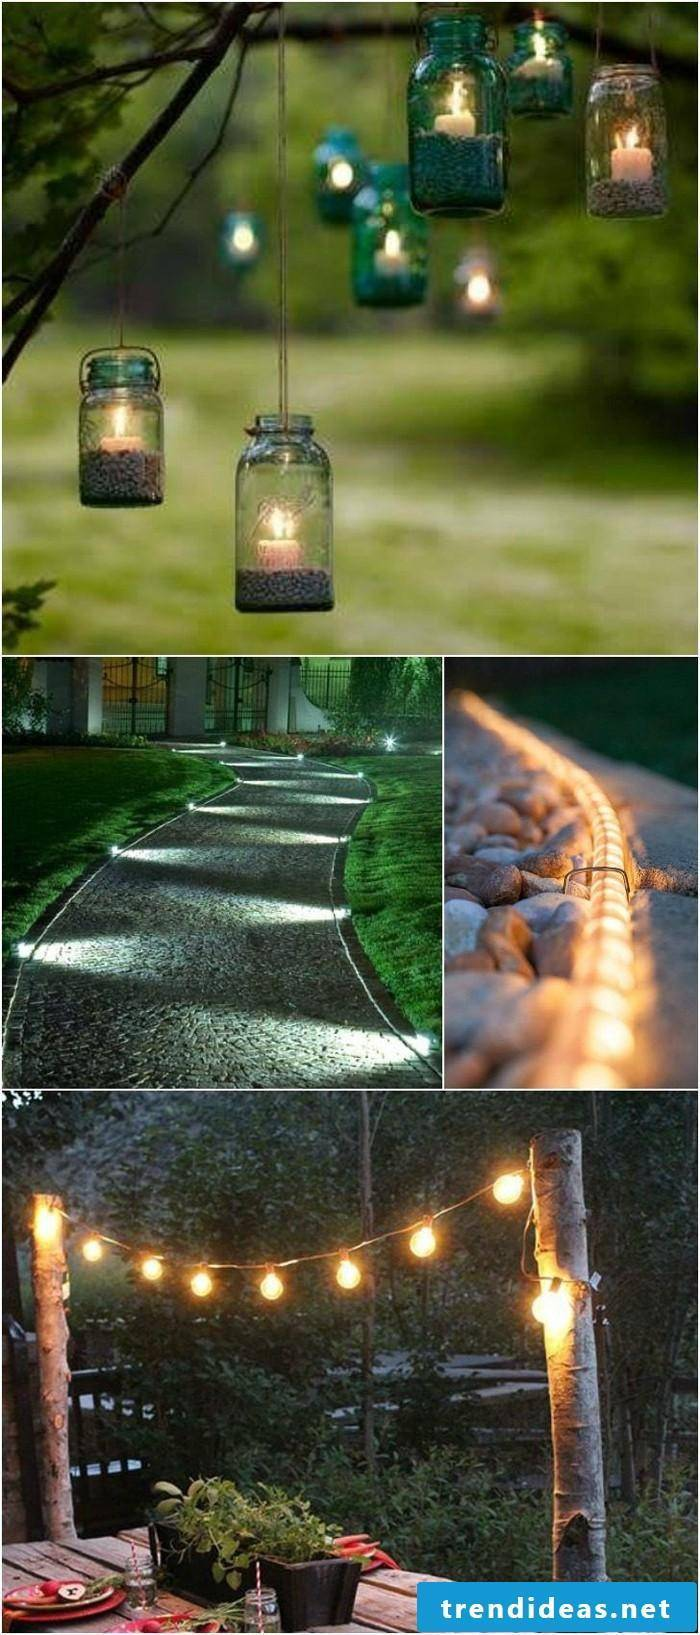 DIY decoration - make lighting yourself